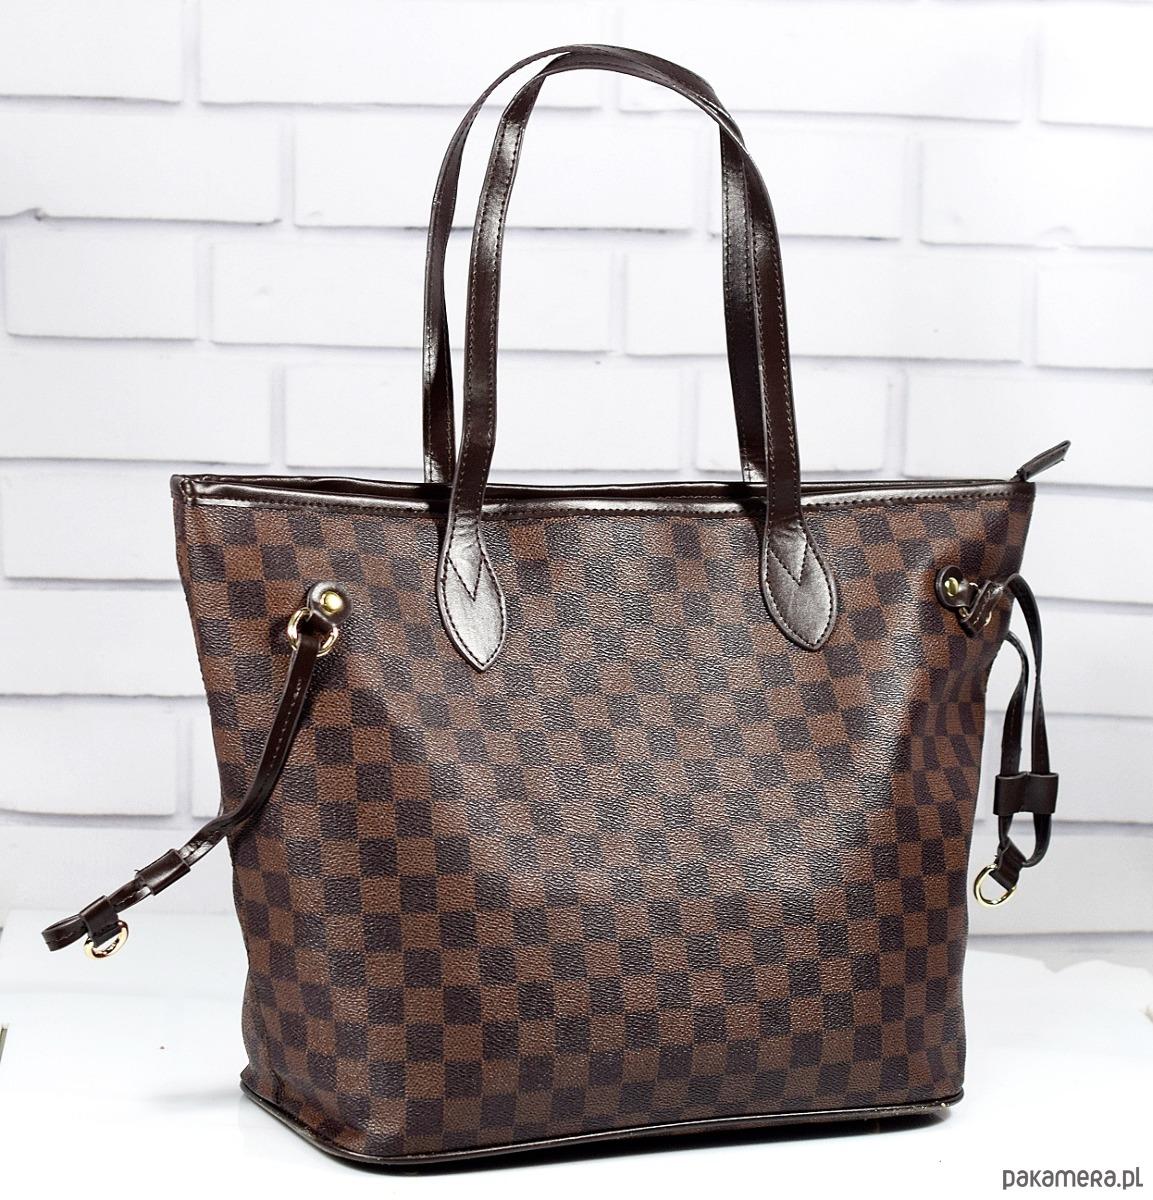 5360db9fd1b37 Torebka damska EMRE brązowa shopper miejska duża - torby na ramię ...